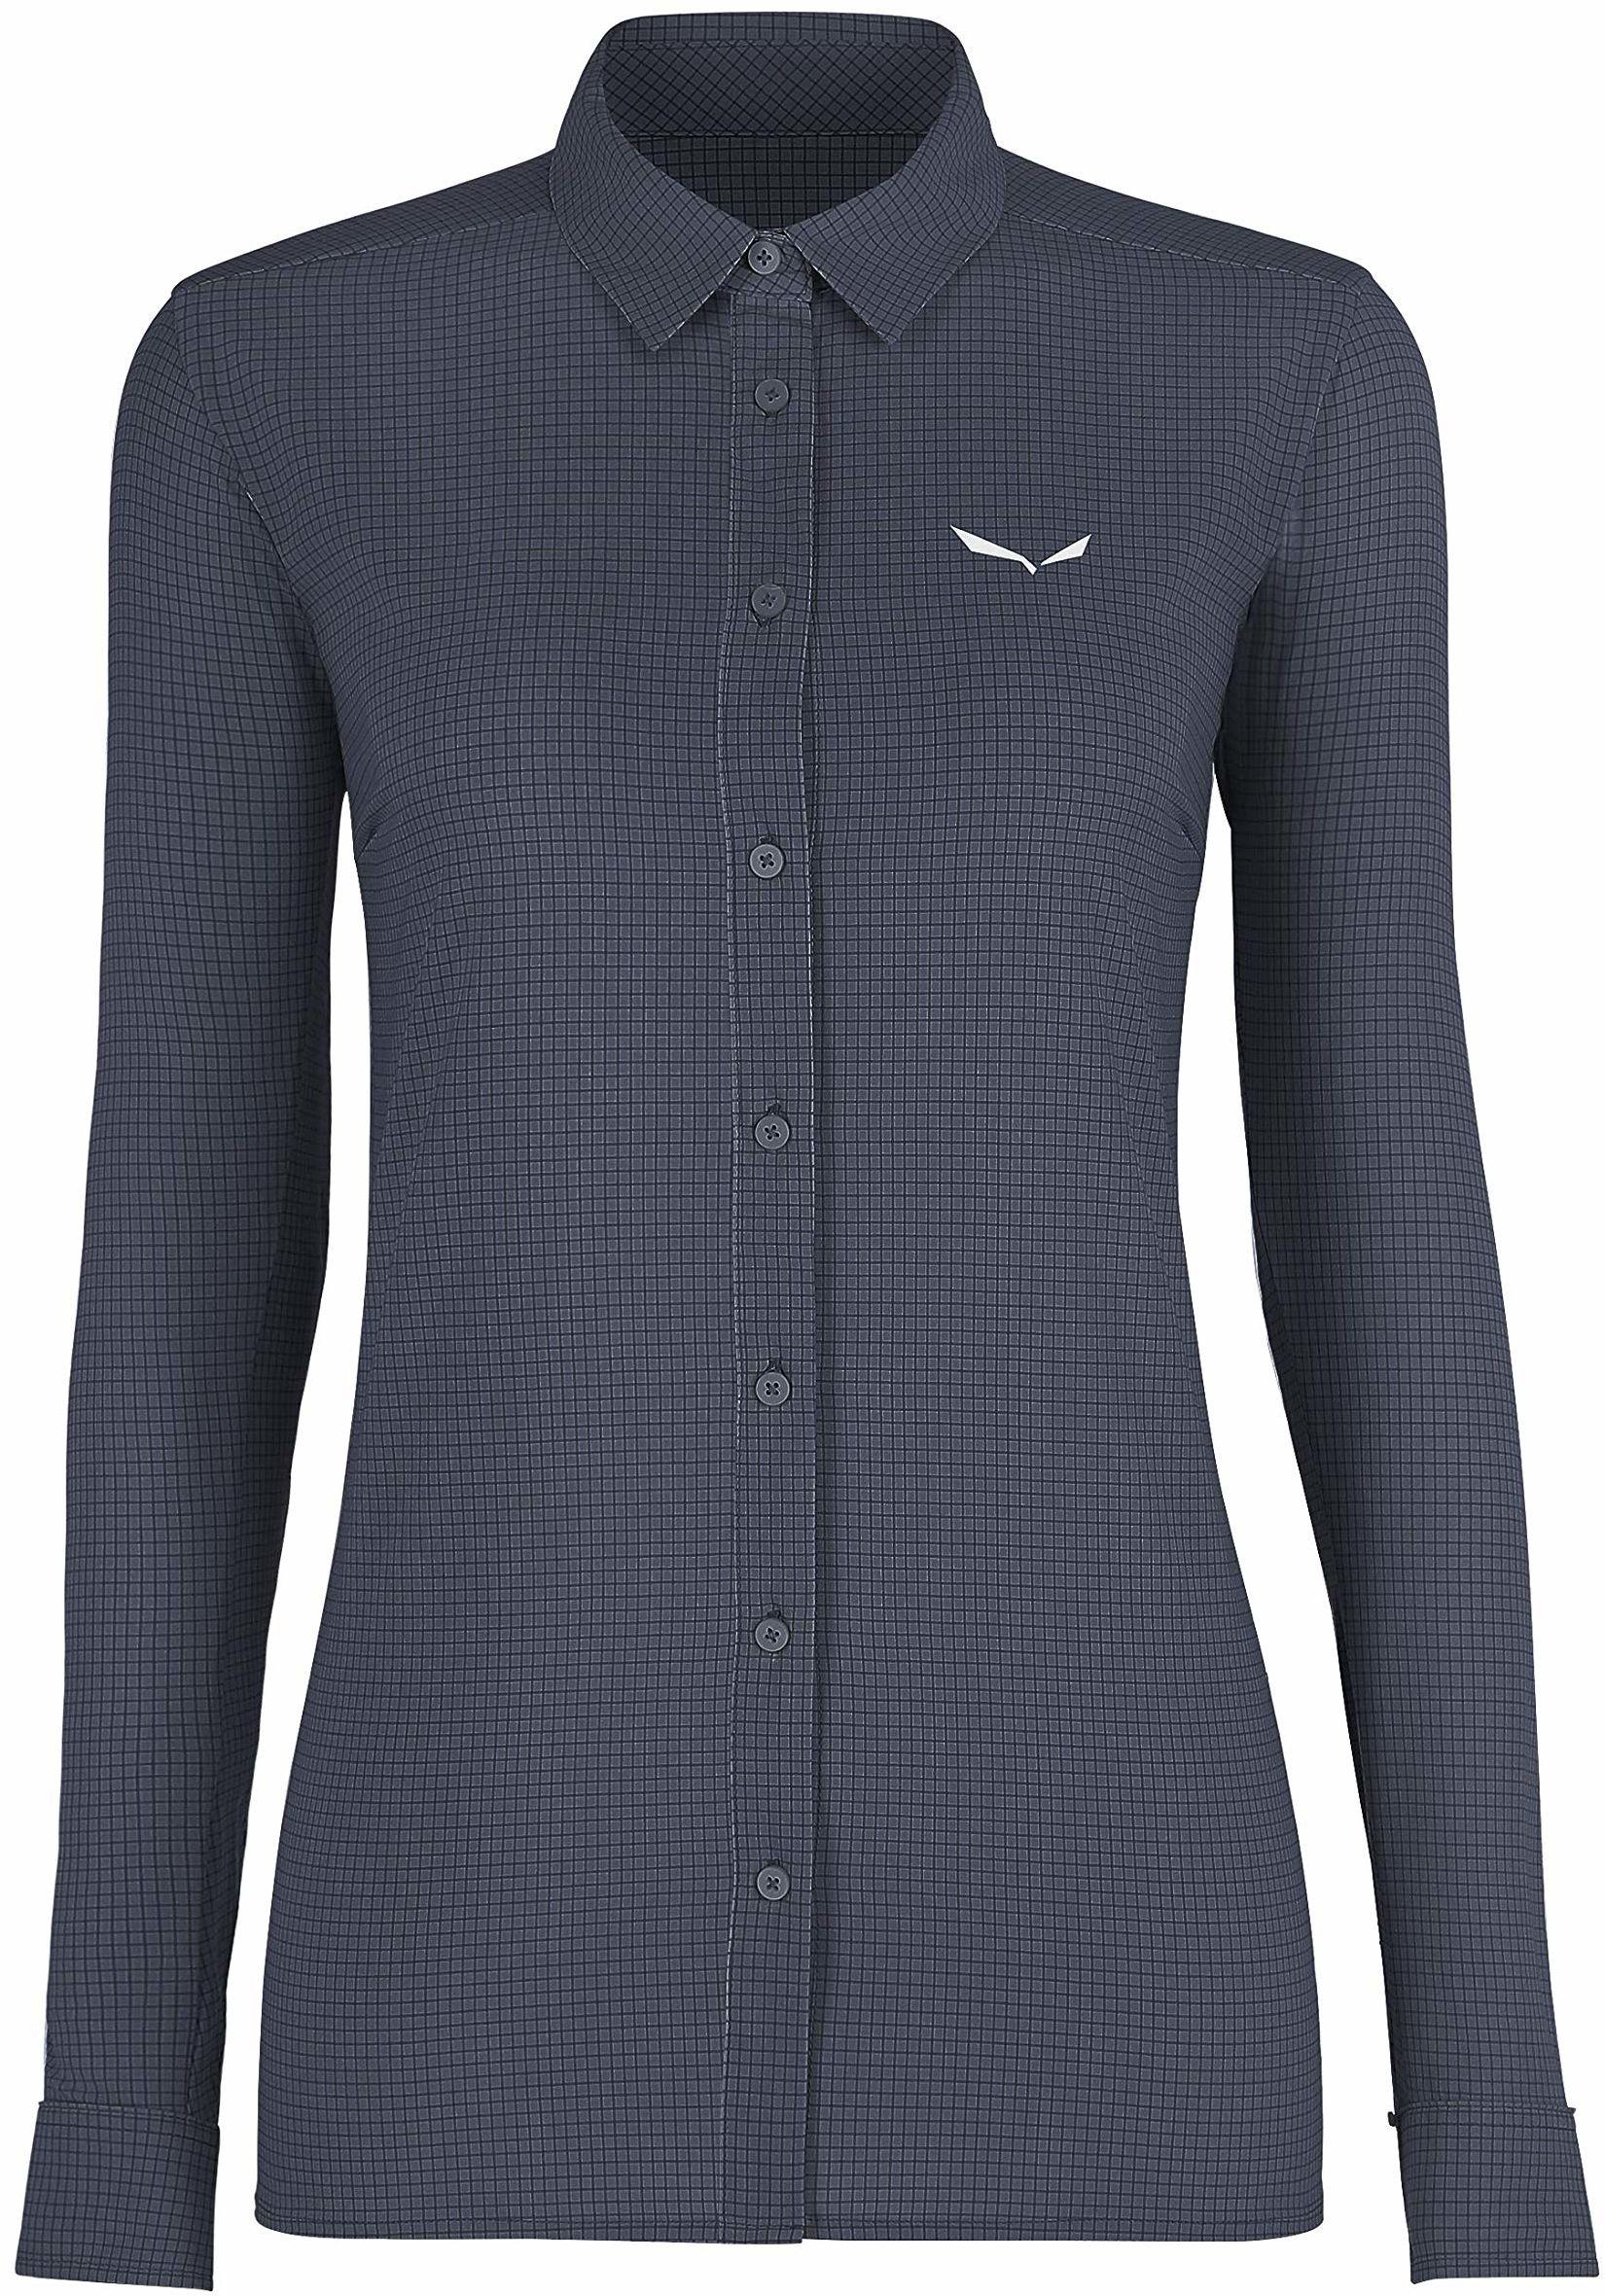 Salewa Damska koszulka Puez Minicheck2 Dry Shirt, ombre Blue, rozmiar 46/40